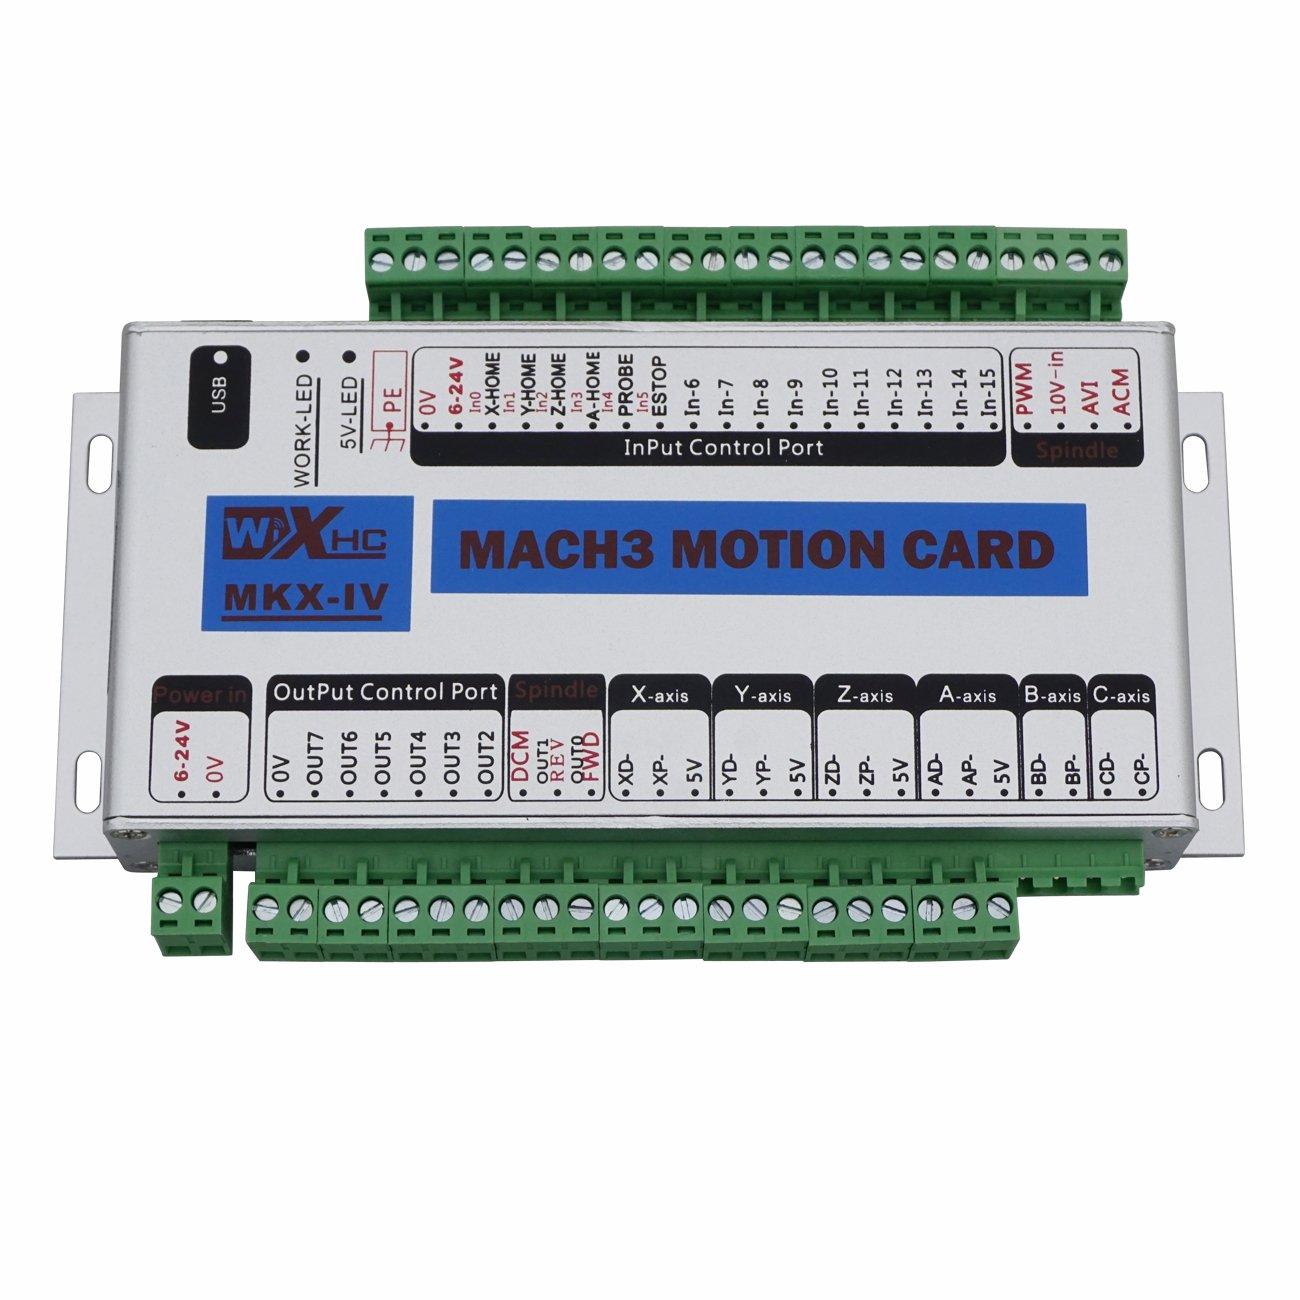 DC-HOUSE 運動制御カード MACH3カード4軸 L09020102006-1   B01LPVEERM